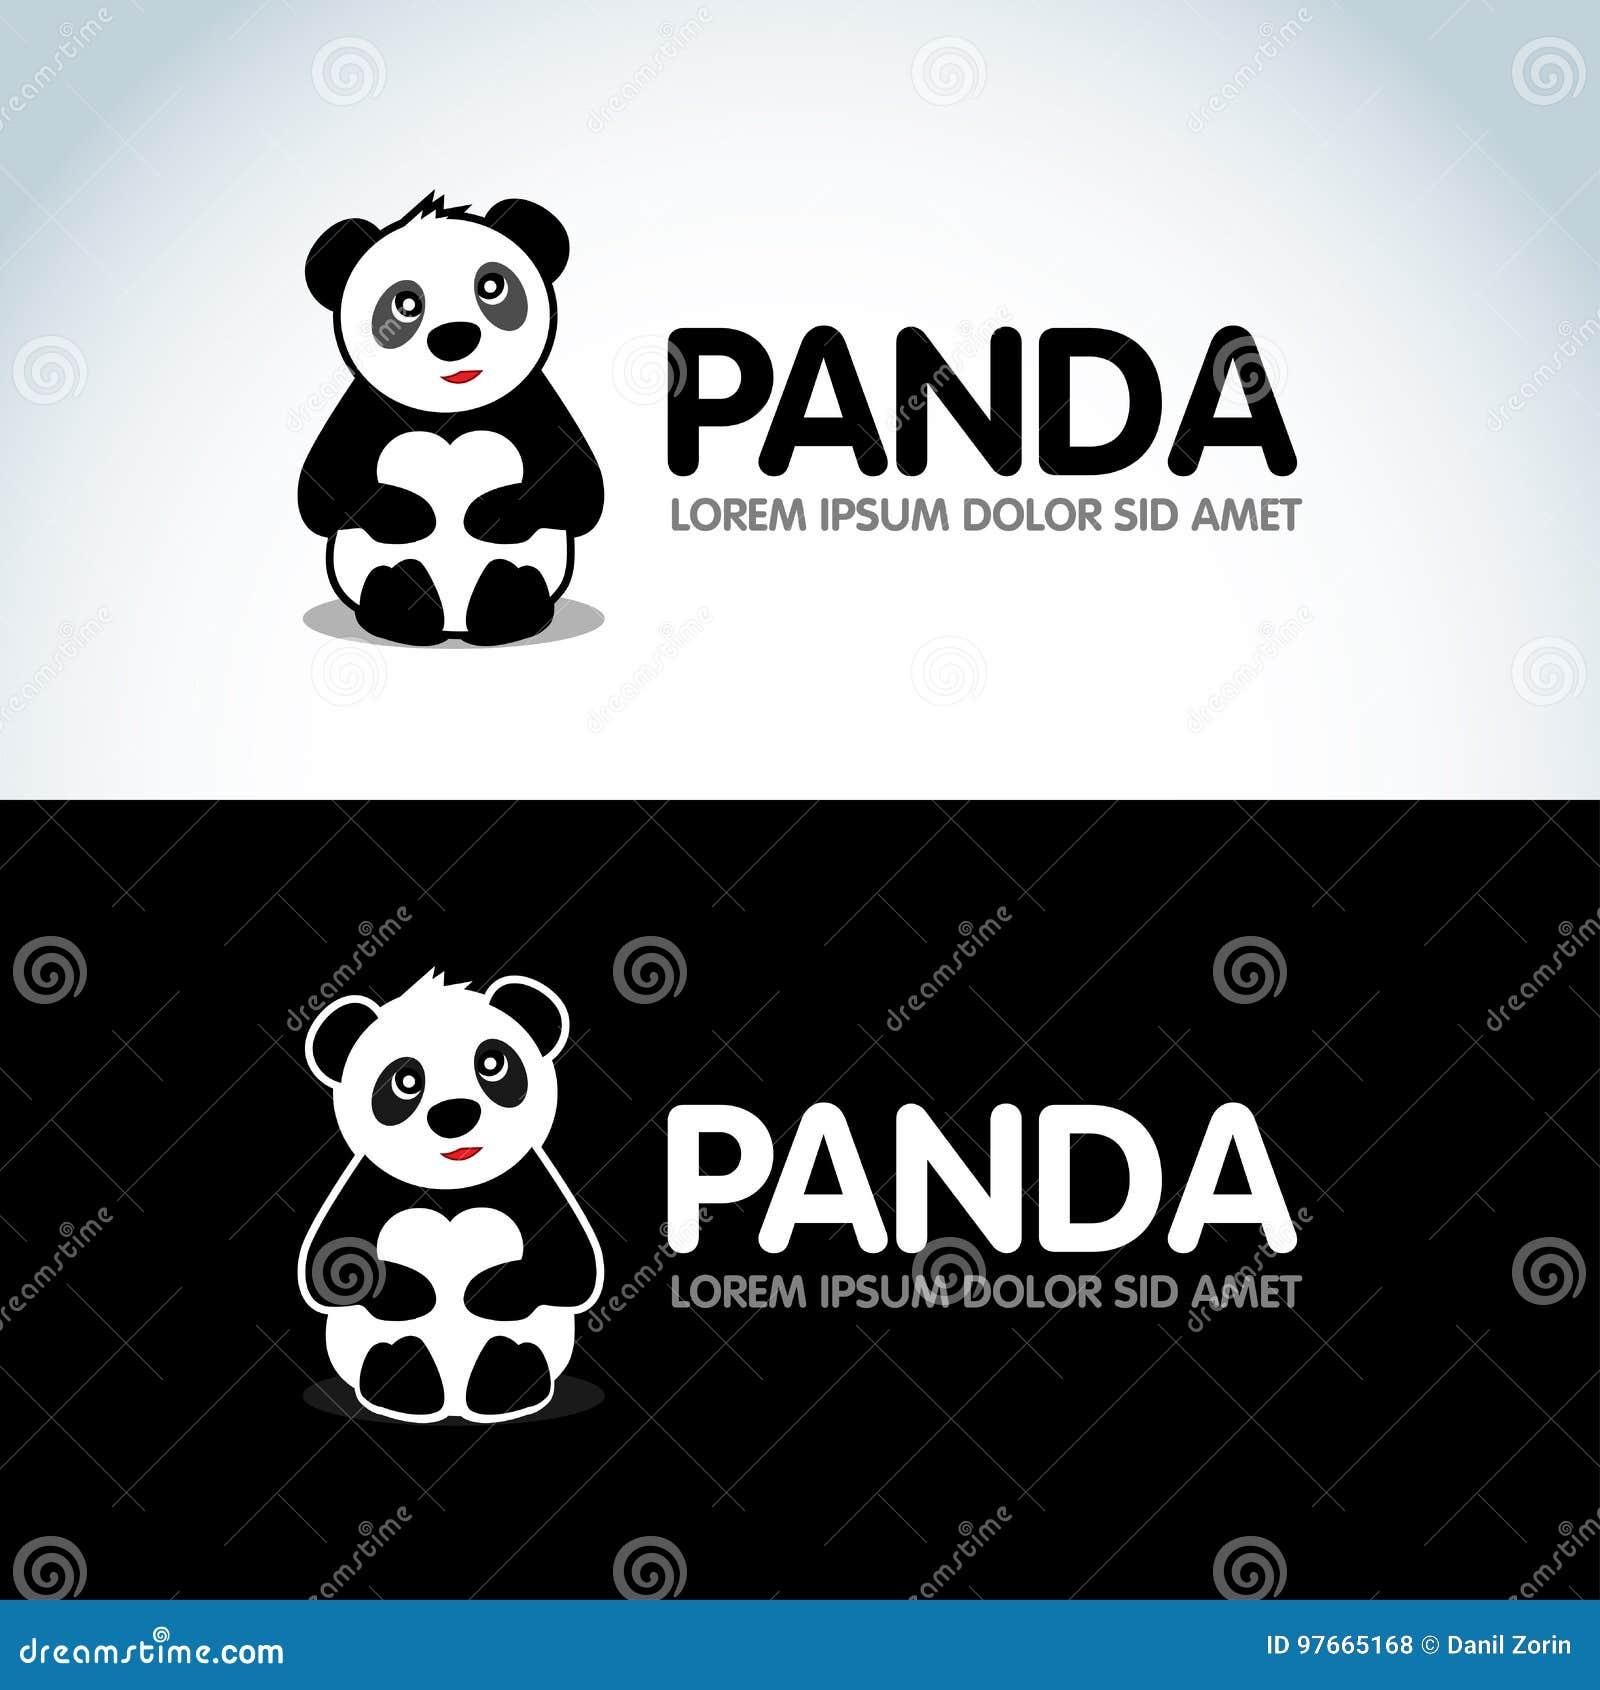 panda bear silhouette logo design template funny lazy logo panda